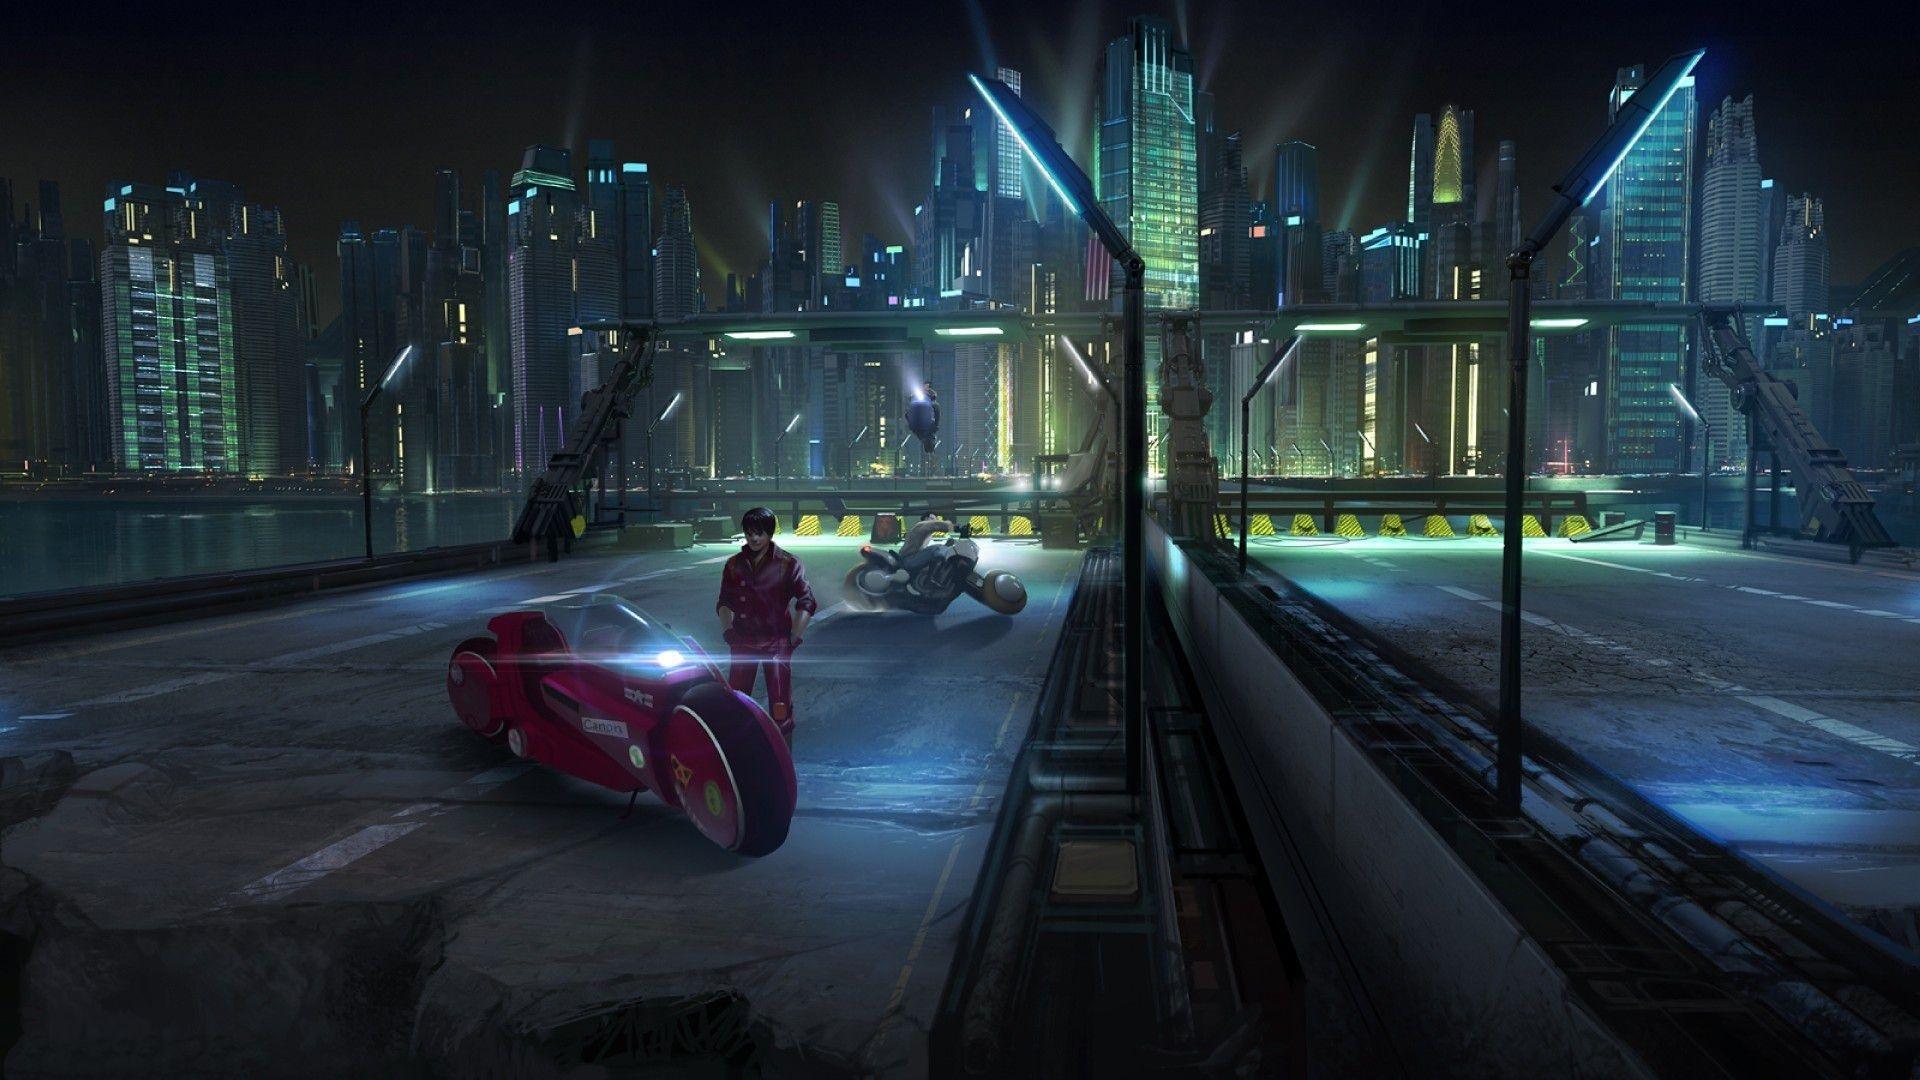 Akira Wallpaper download wallpaper image